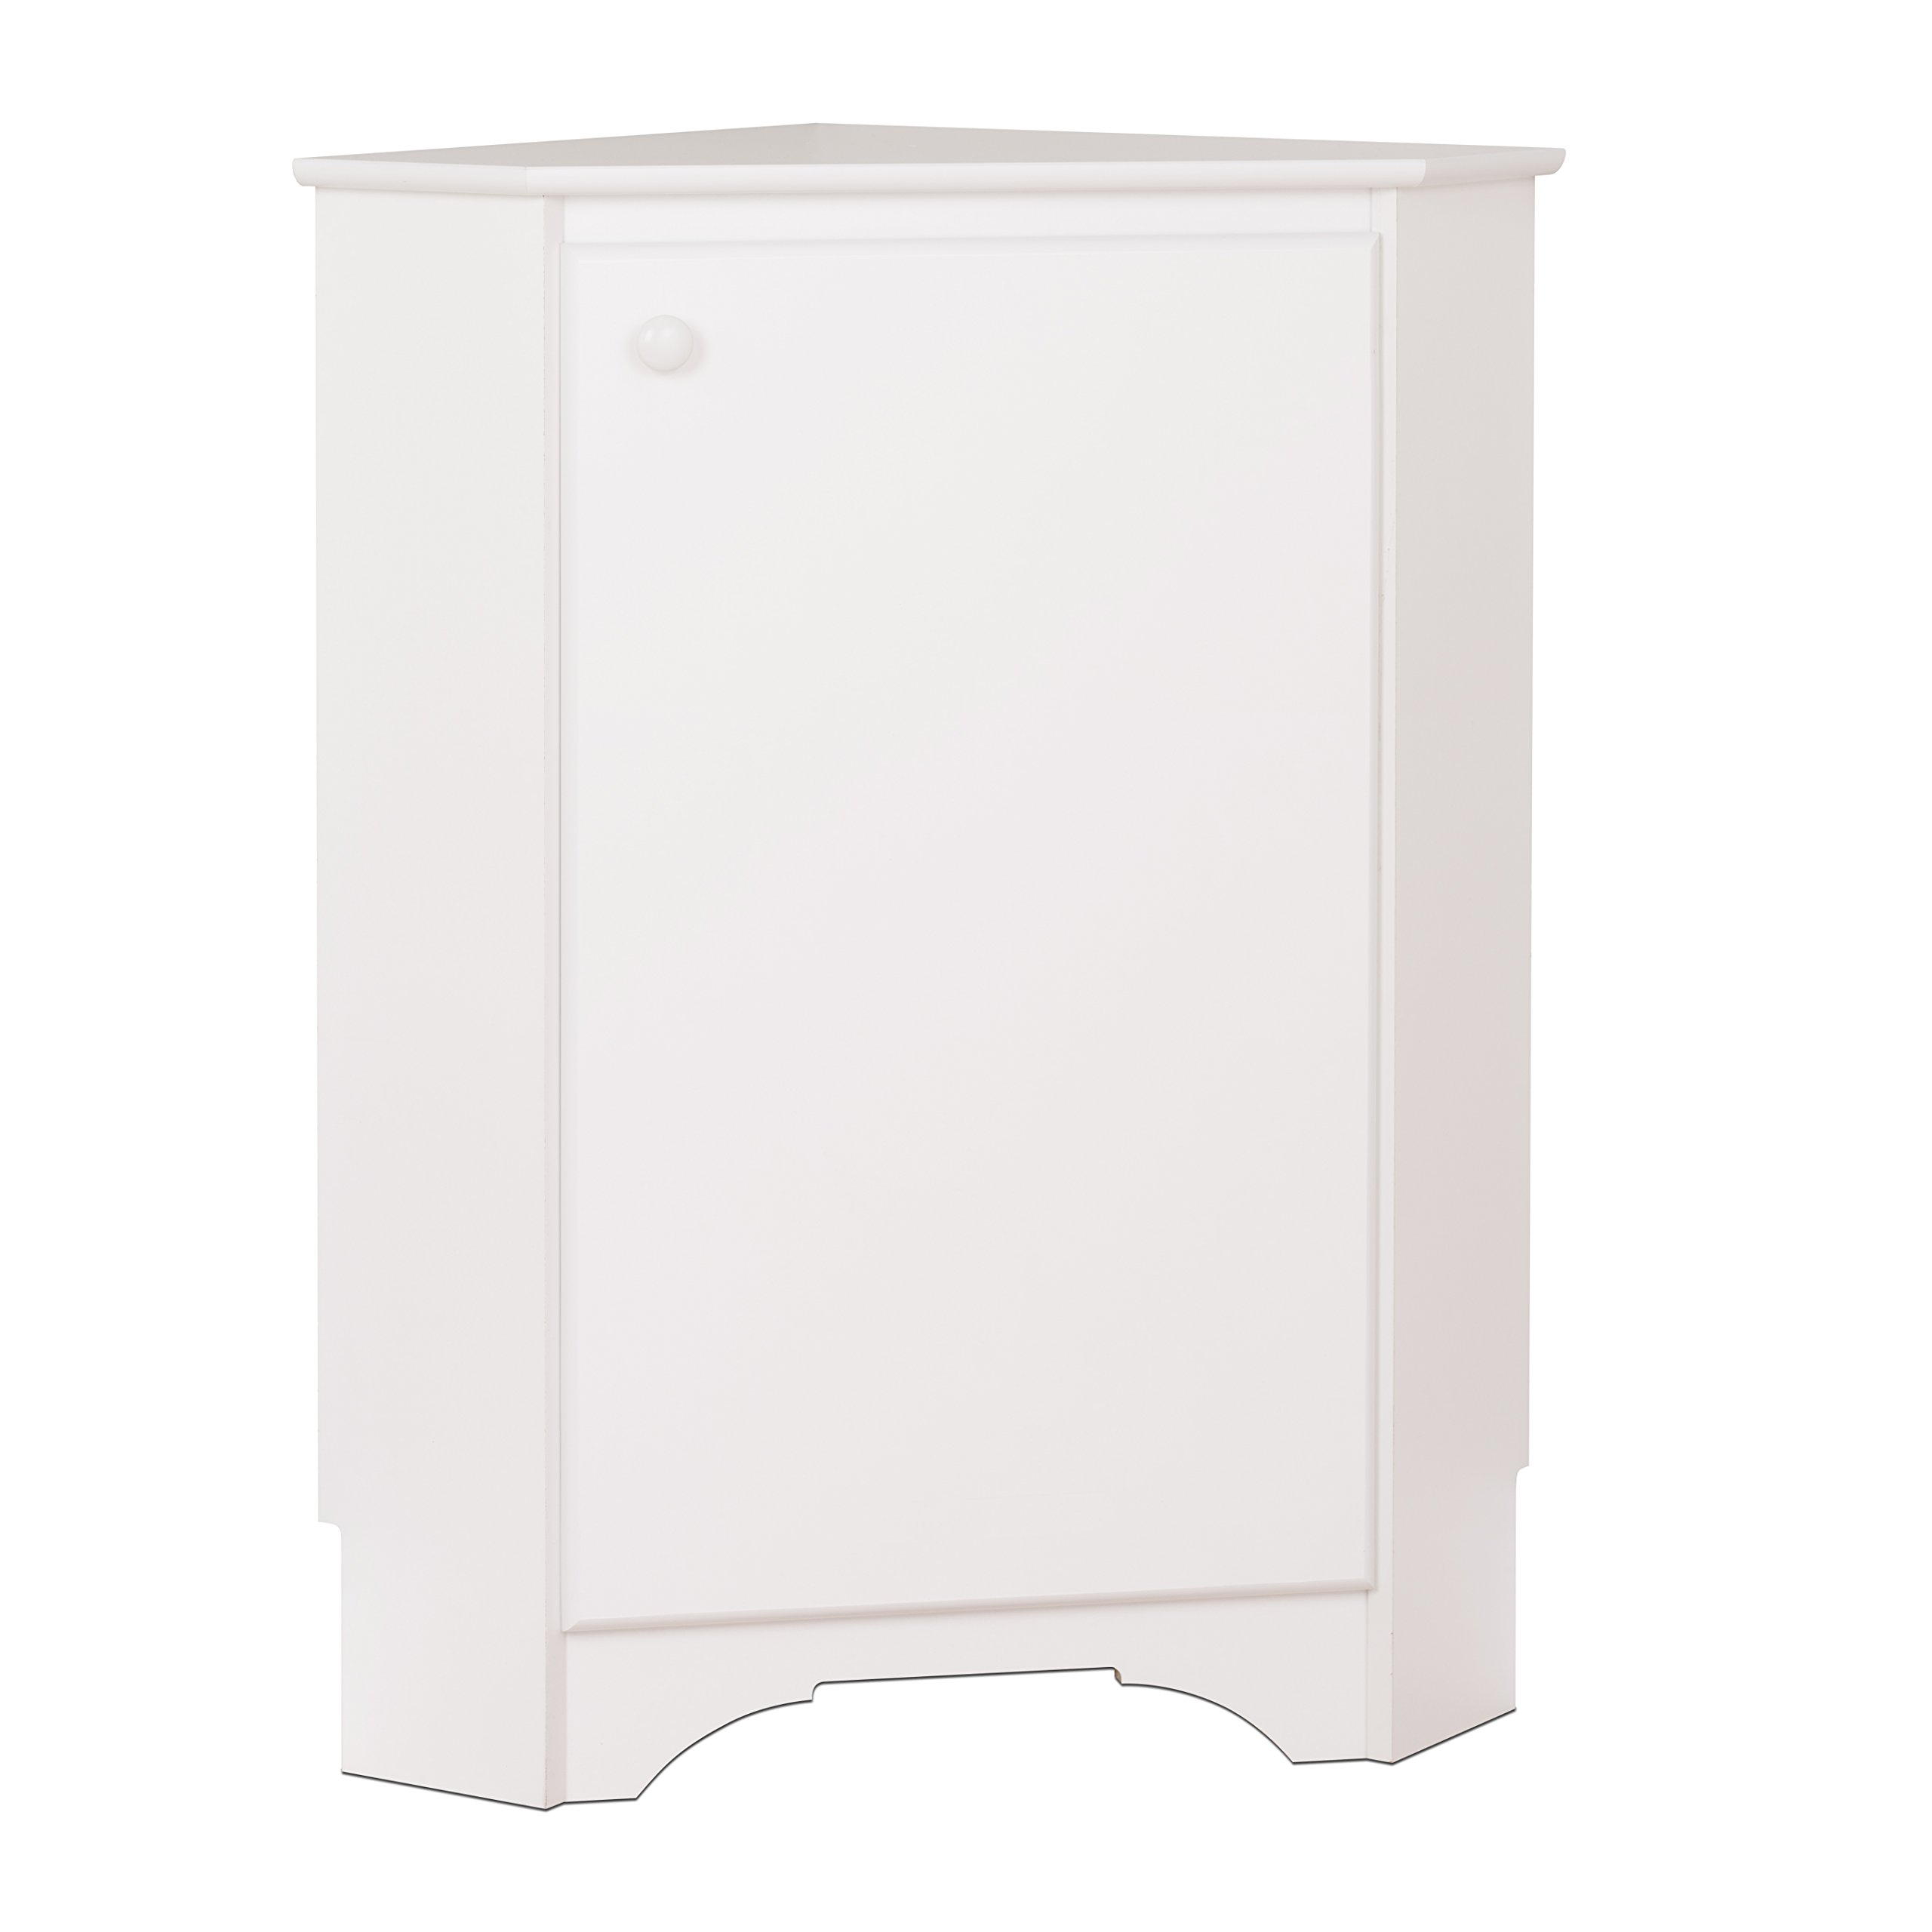 Prepac WSCC-0603-1 Home, Elite Corner Storage Cabinet, White